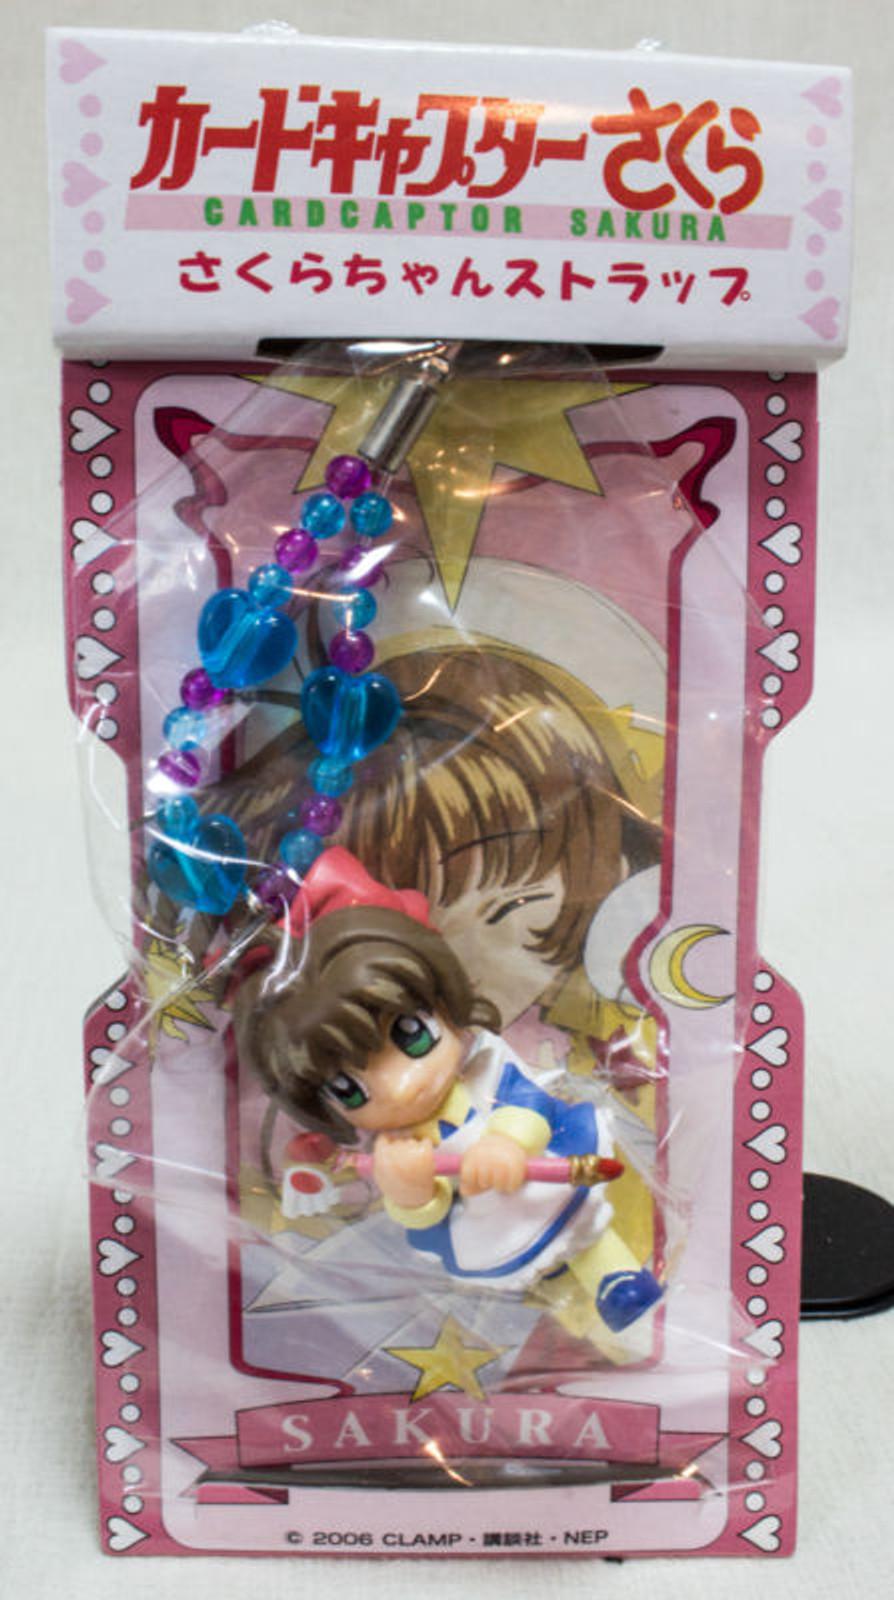 RARE! Cardcaptor Sakura Mascot Figure Mobile Strap 3 CLAMP SEGA JAPAN ANIME